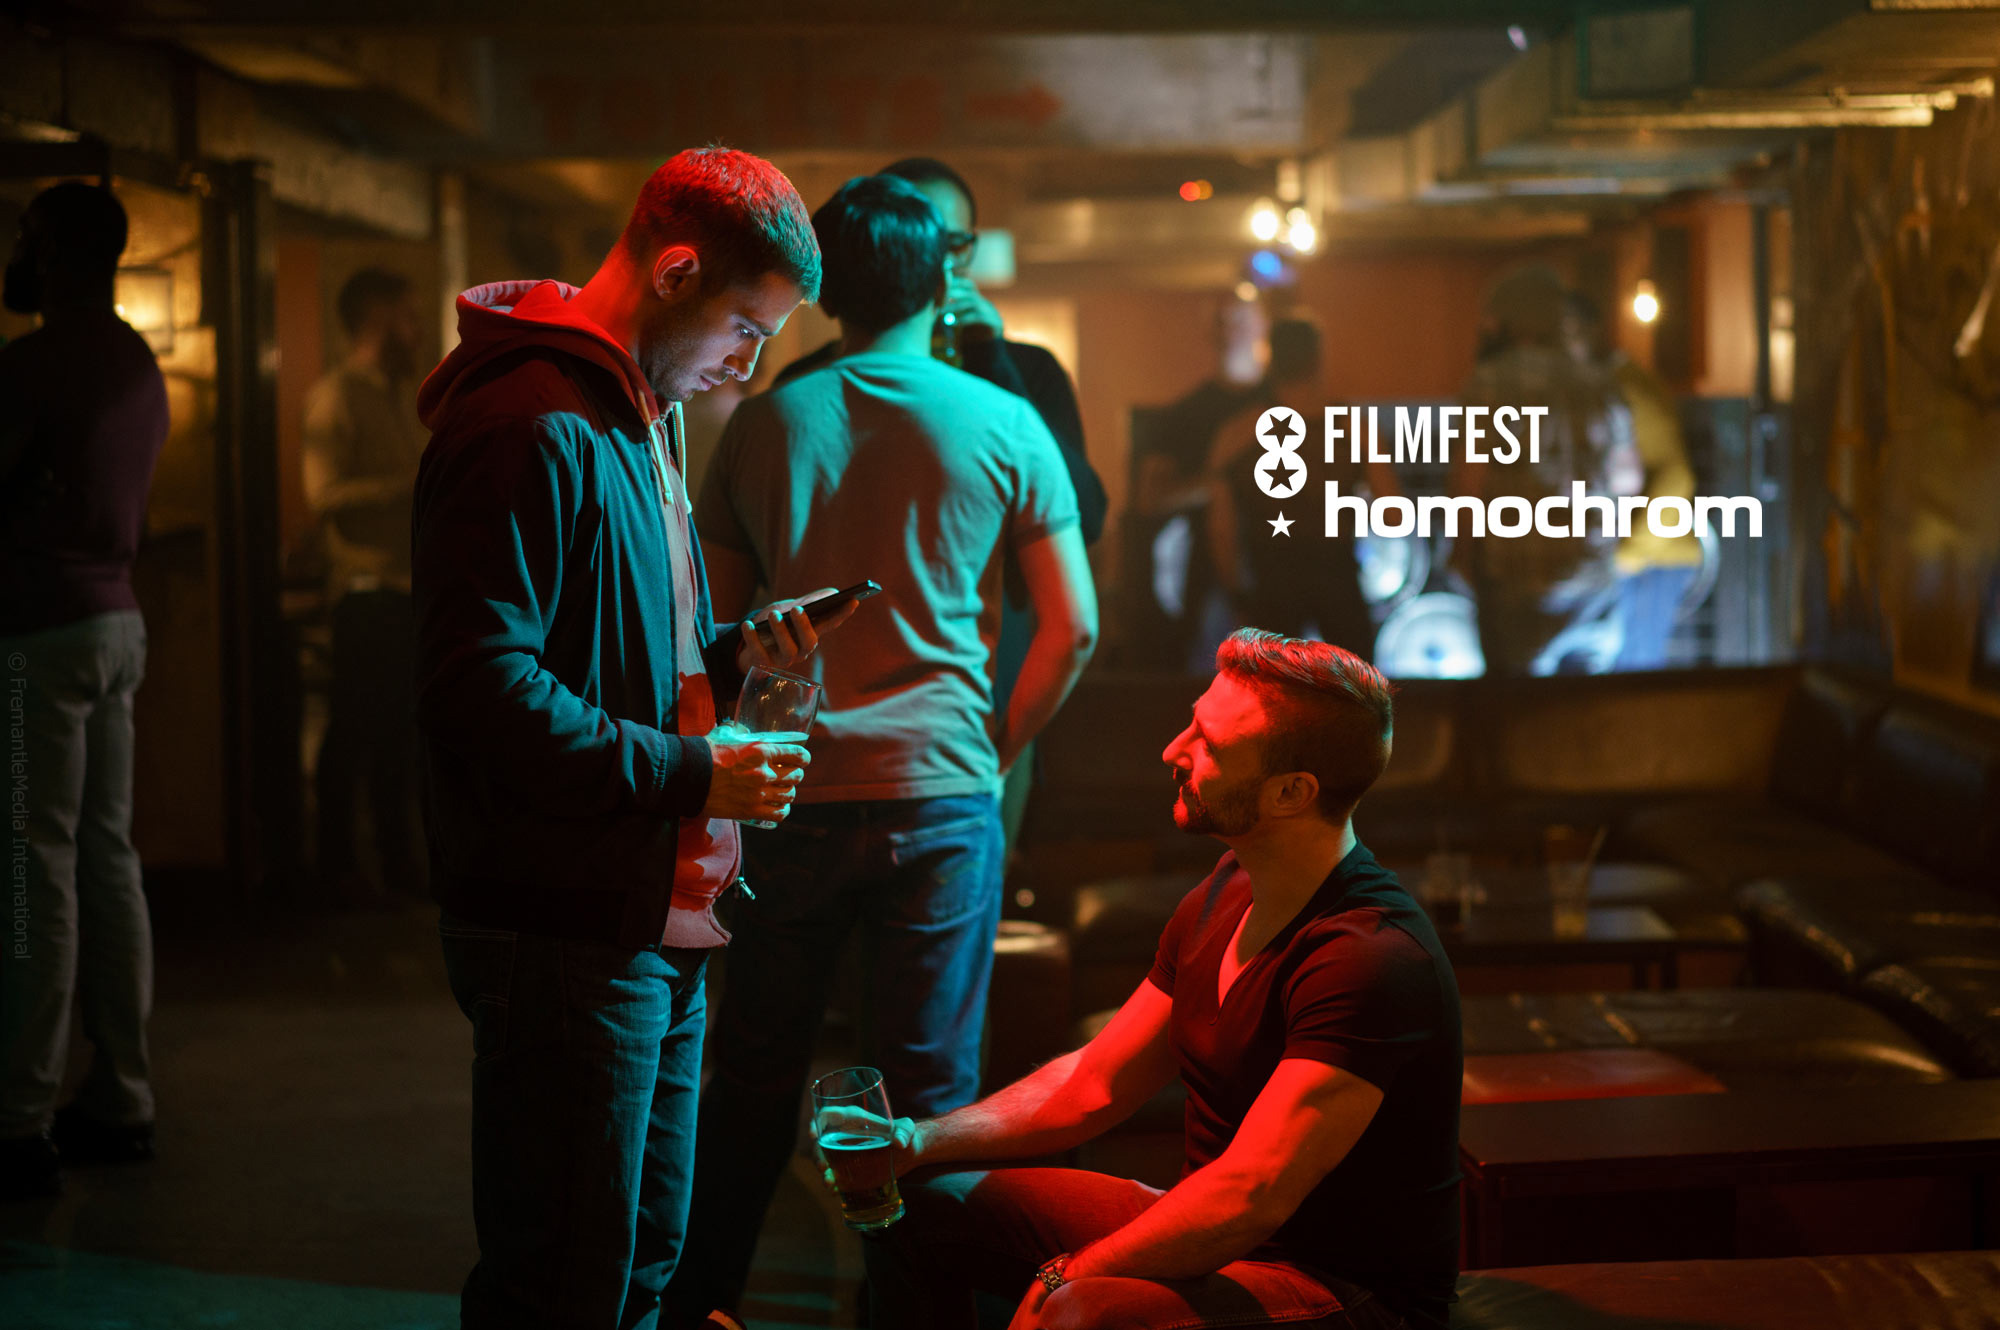 5 Top Gay Films Homochrom Filmfest 2018 @ Man in an Orange Shirt